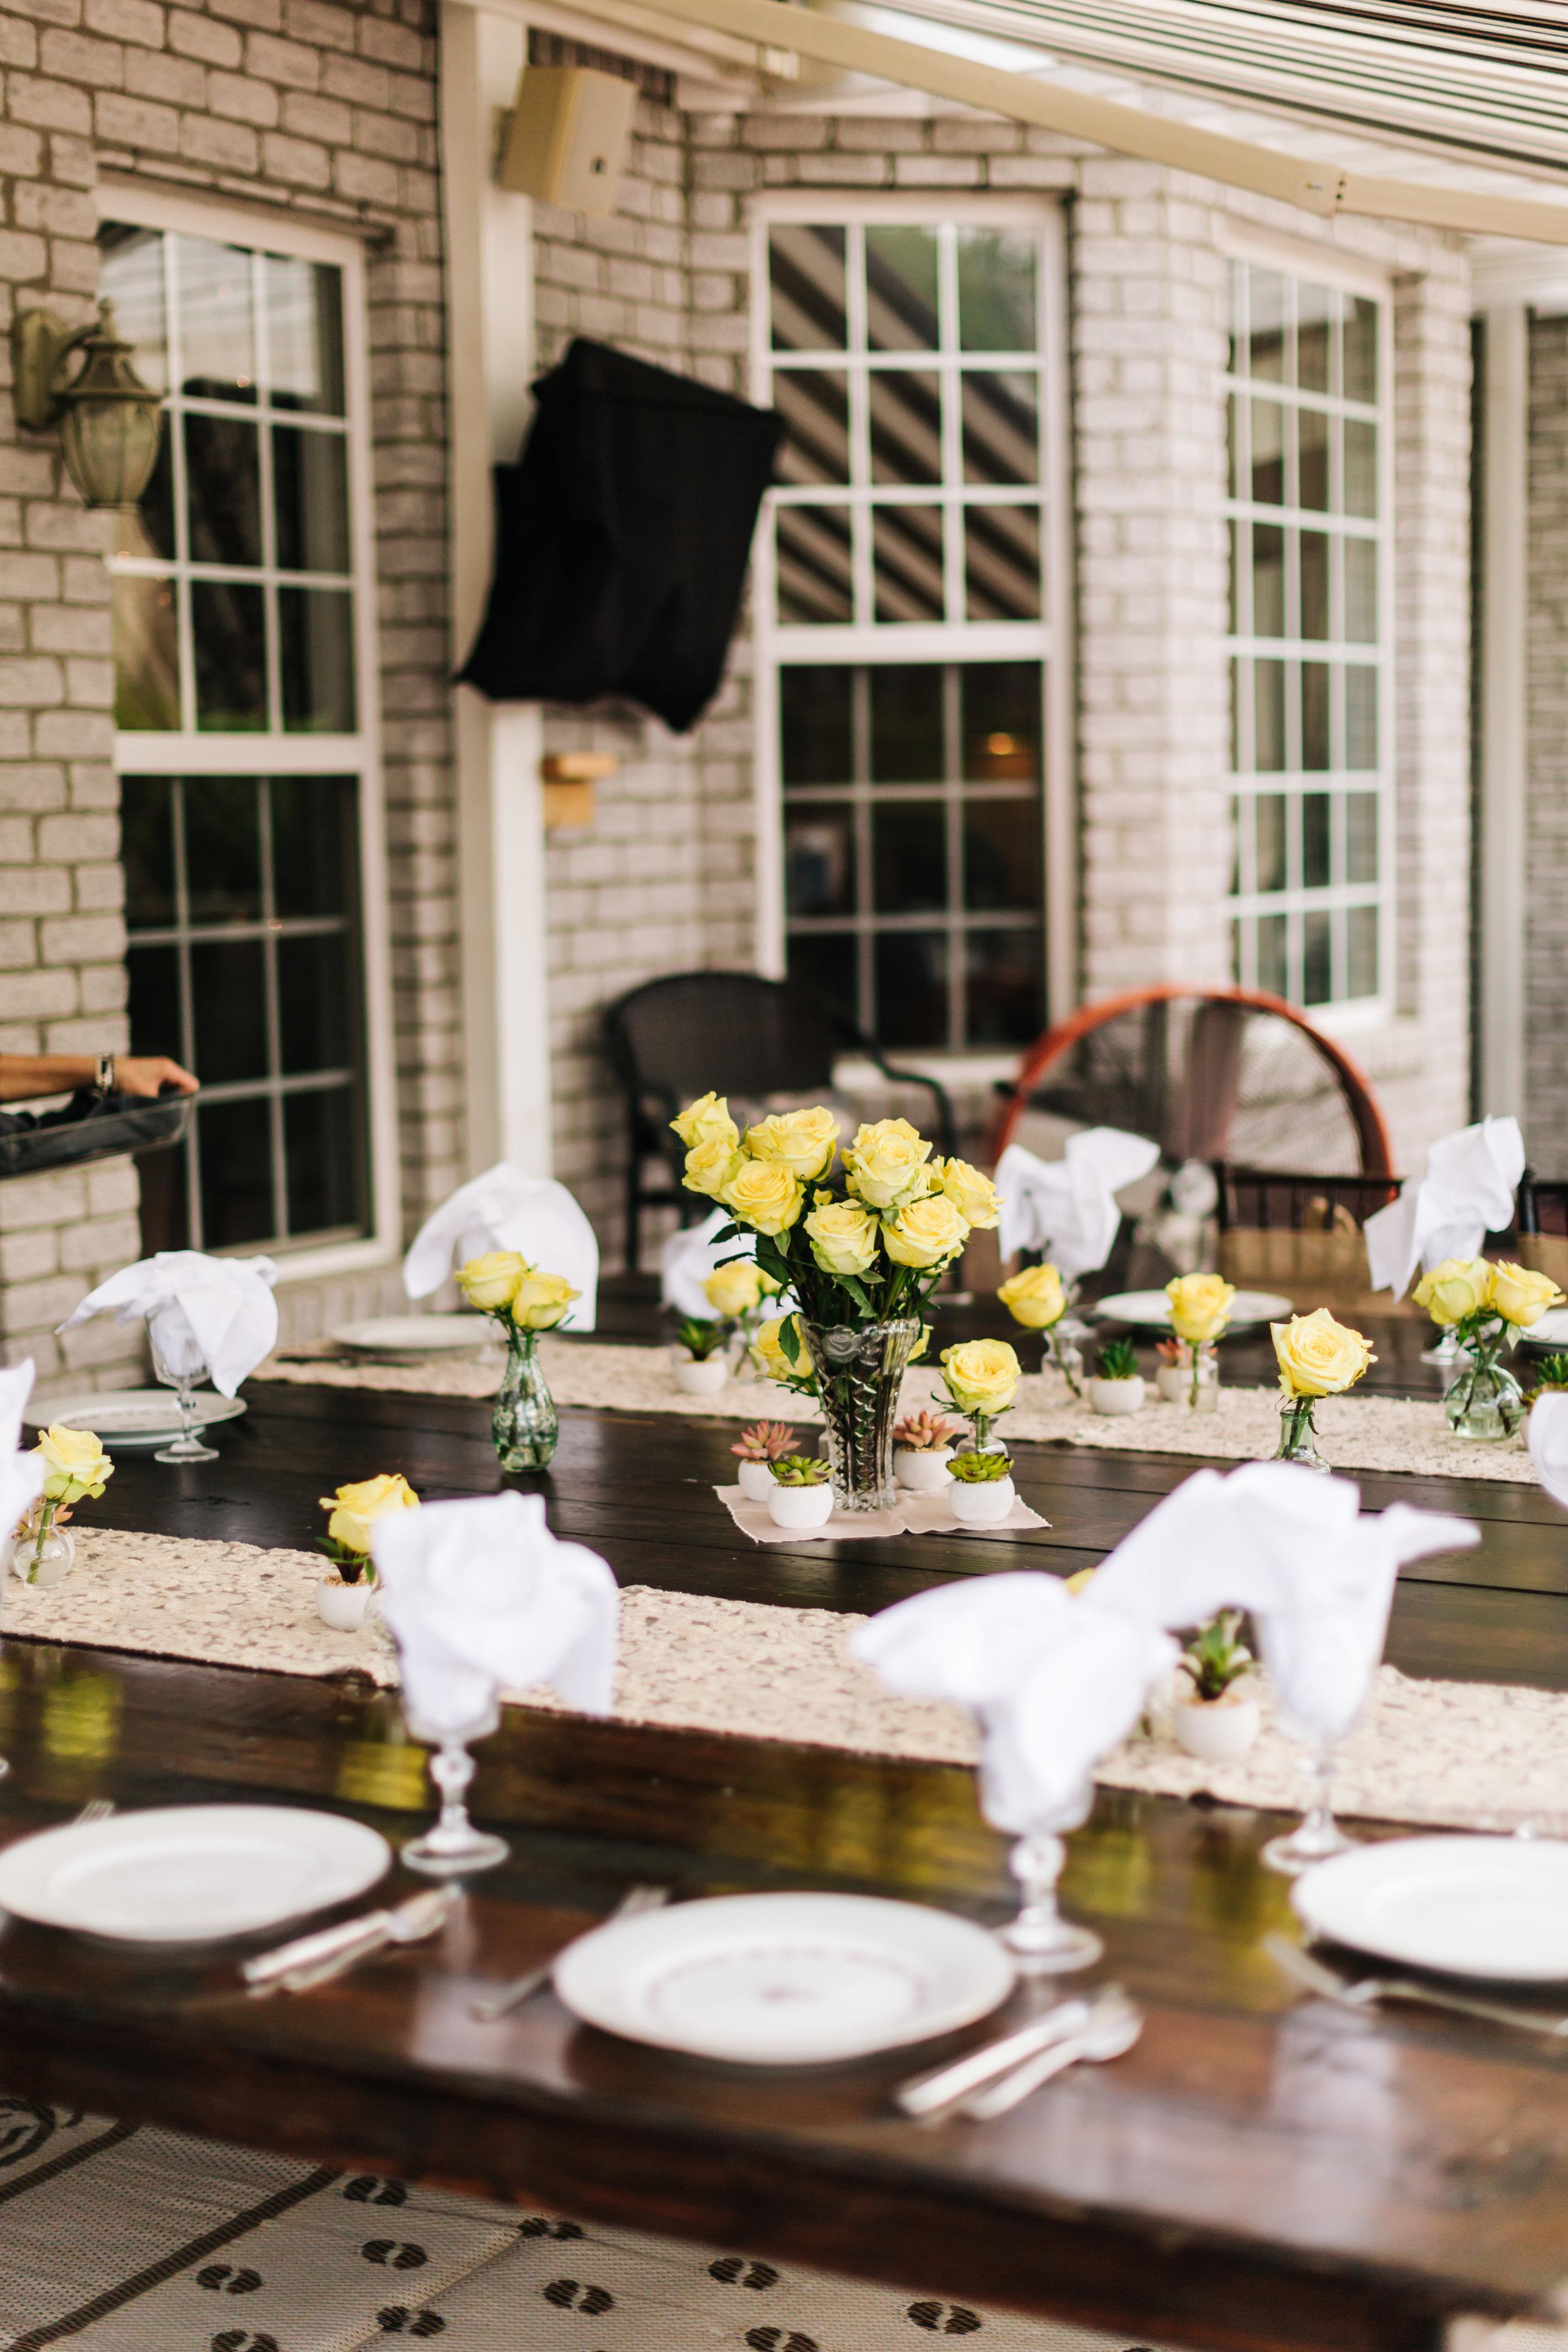 2018.09.02 Ray and Sarah Prizner Nashville TN Wedding FINALS-208.jpg